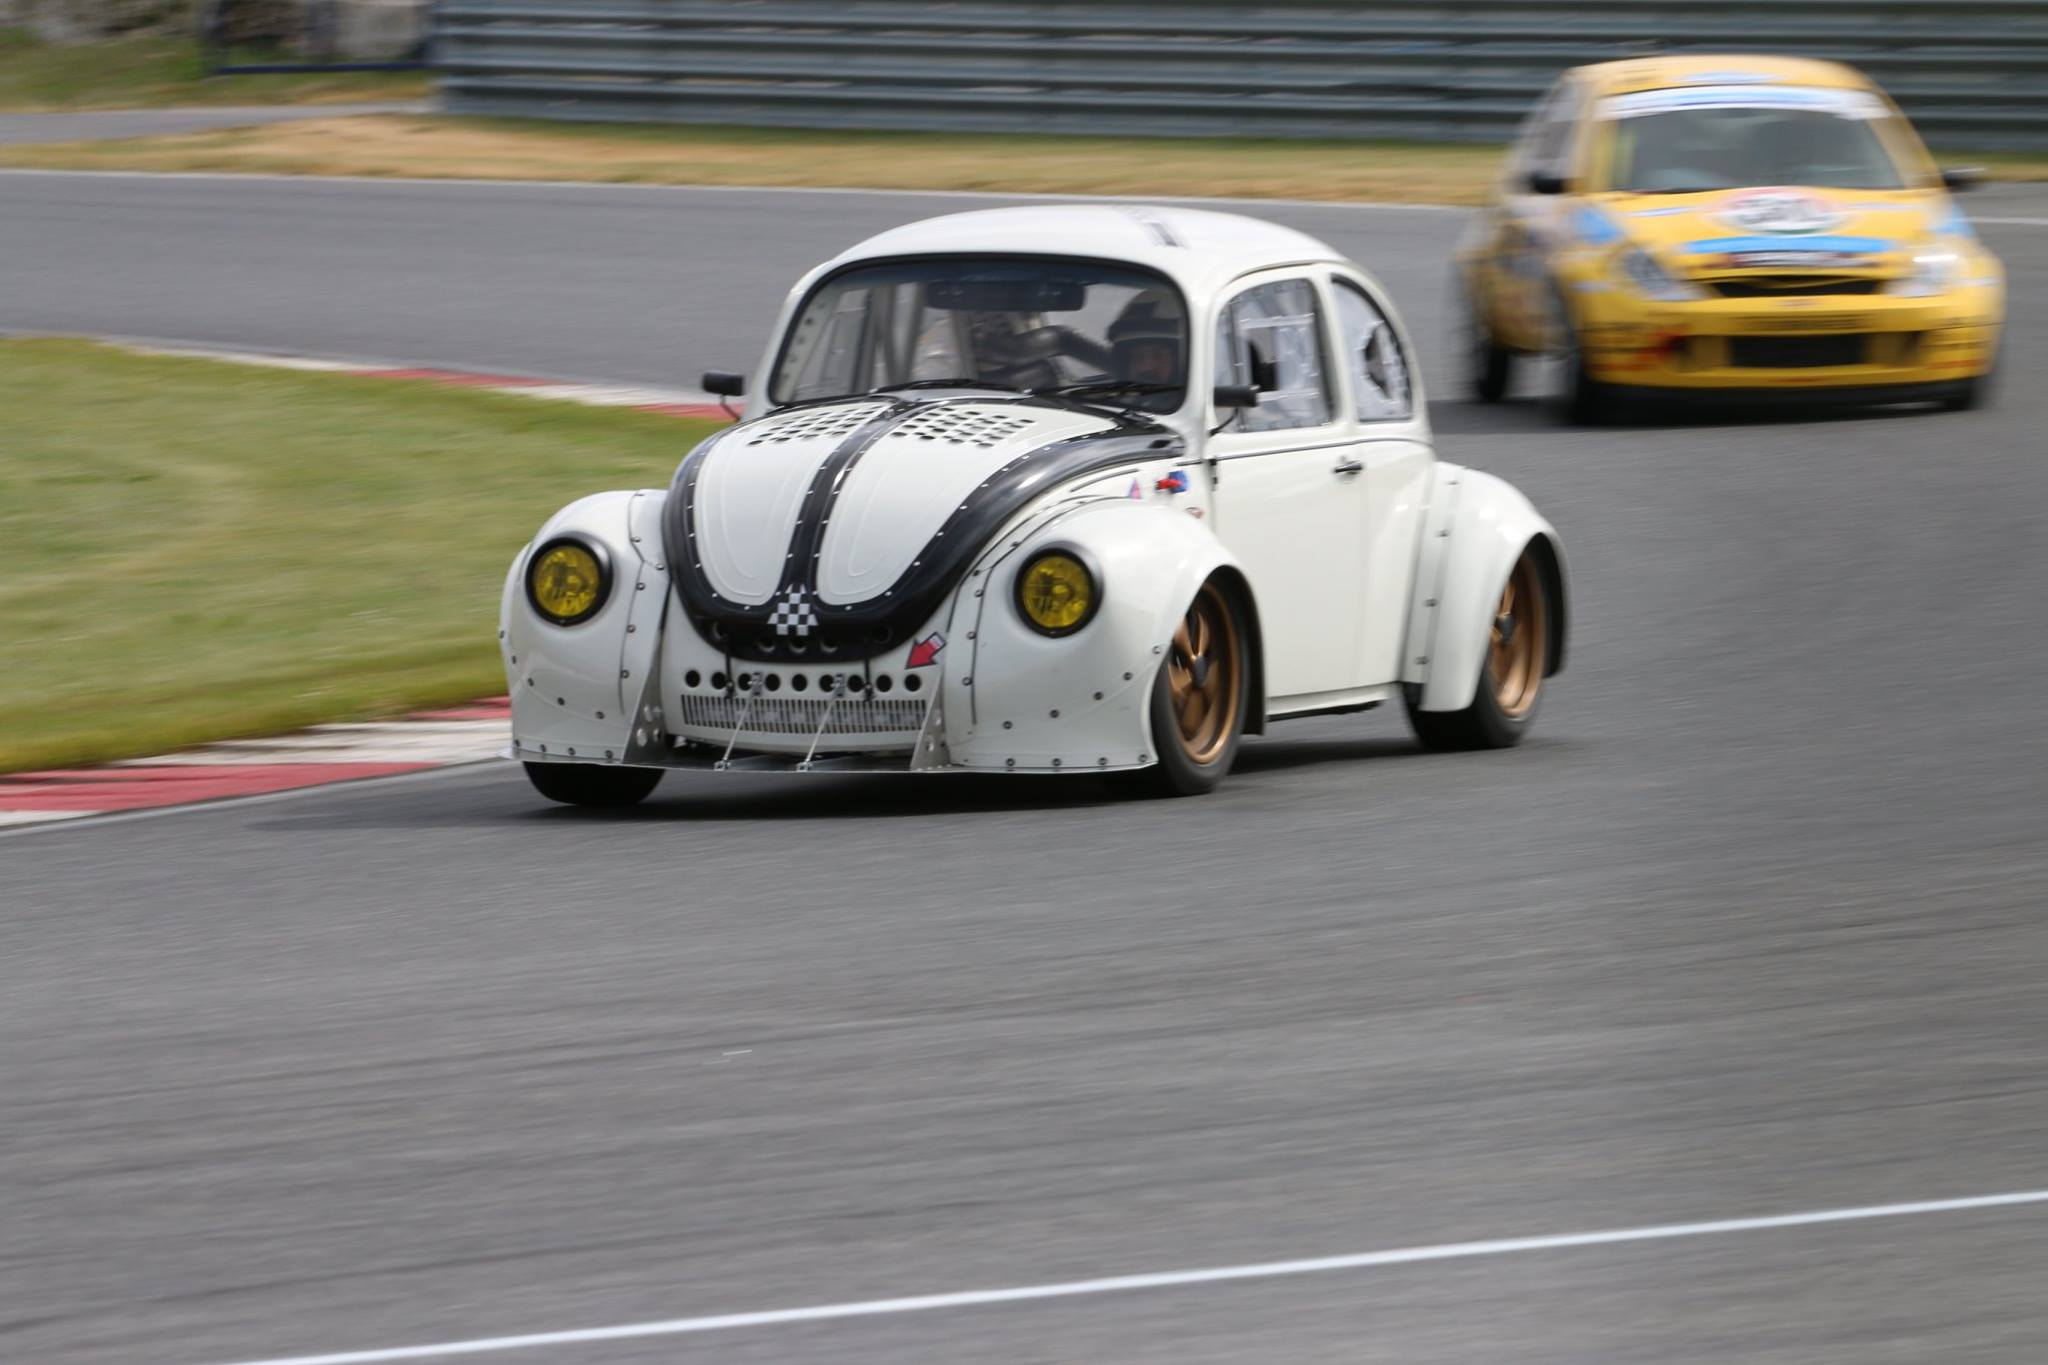 VW Beetle with a Honda CBR1000RR Engine – Engine Swap Depot